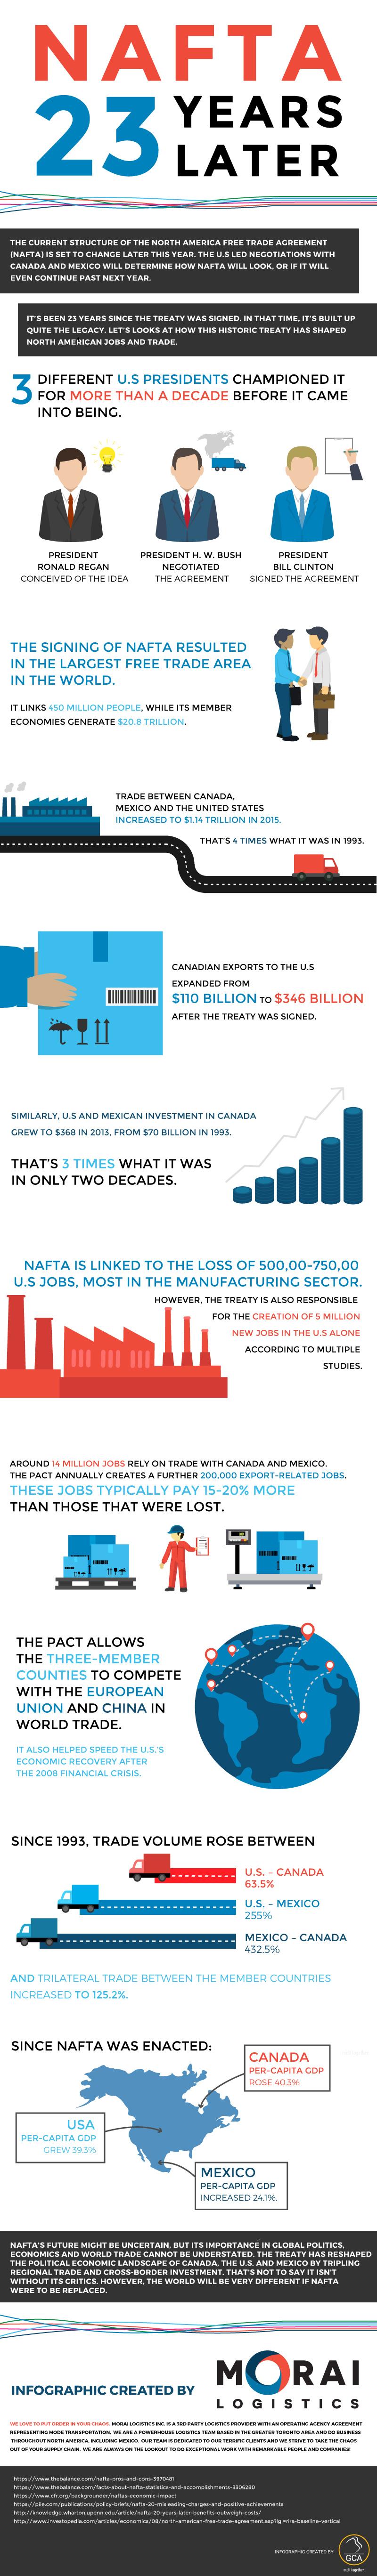 morai-logistics-nafta-23-years-later